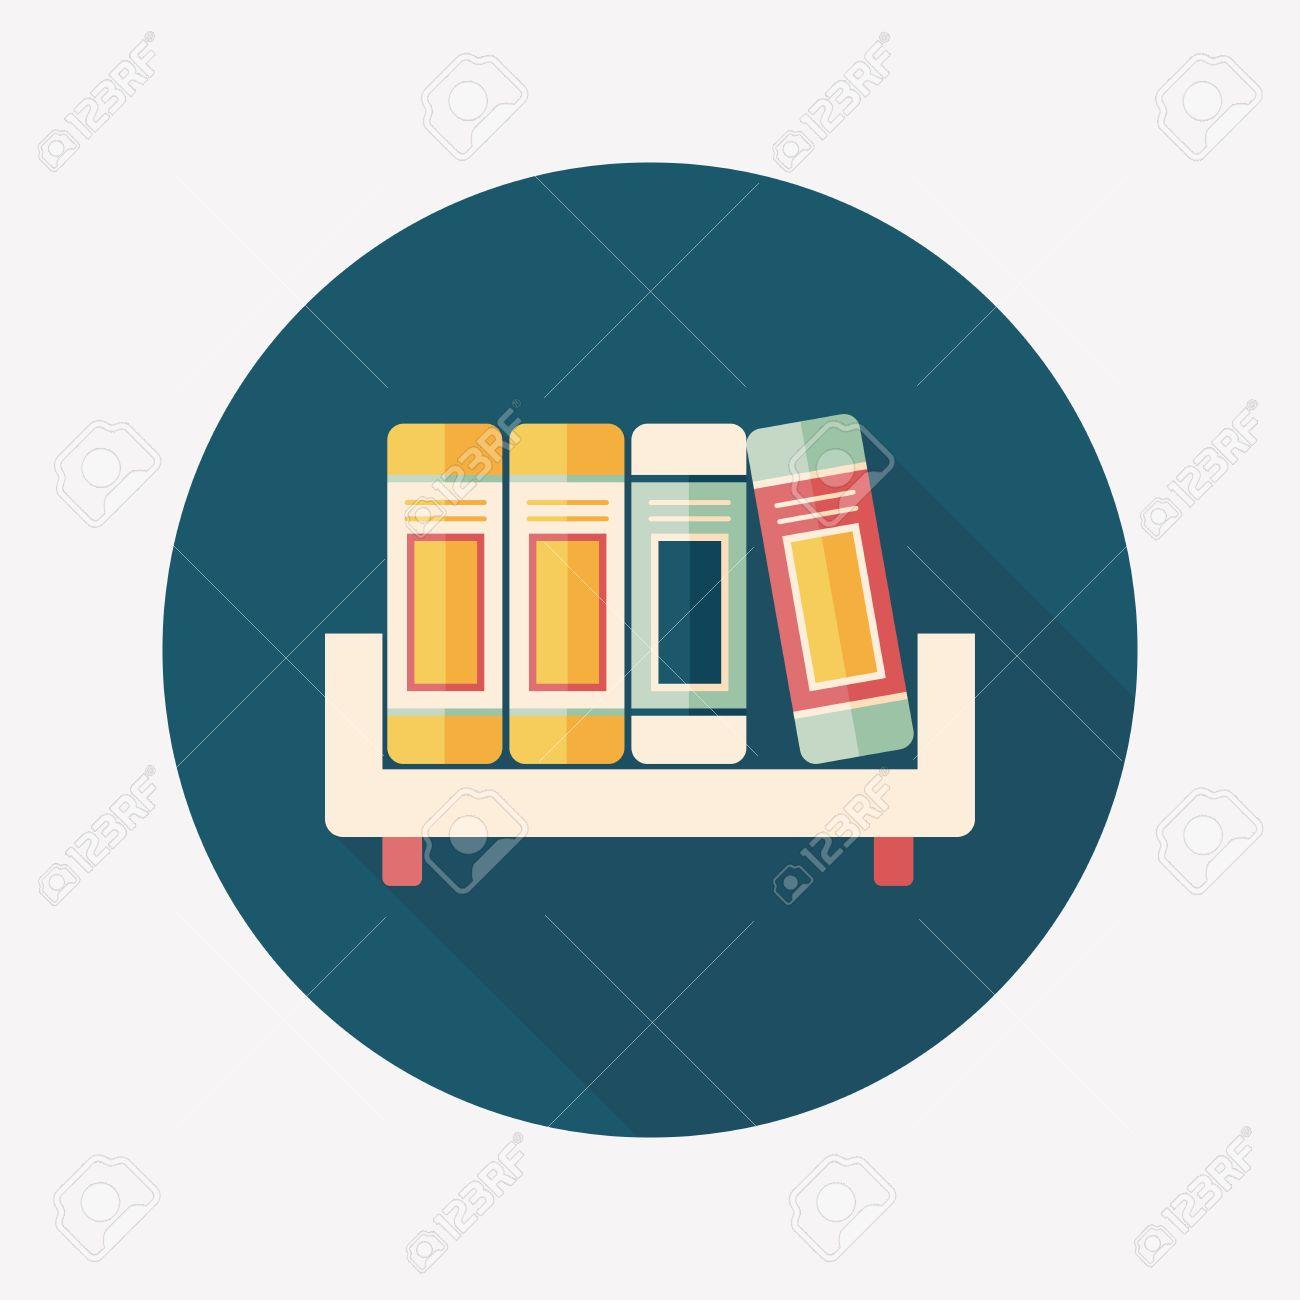 bookshelf flat icon with long shadow,eps10 - 31696584